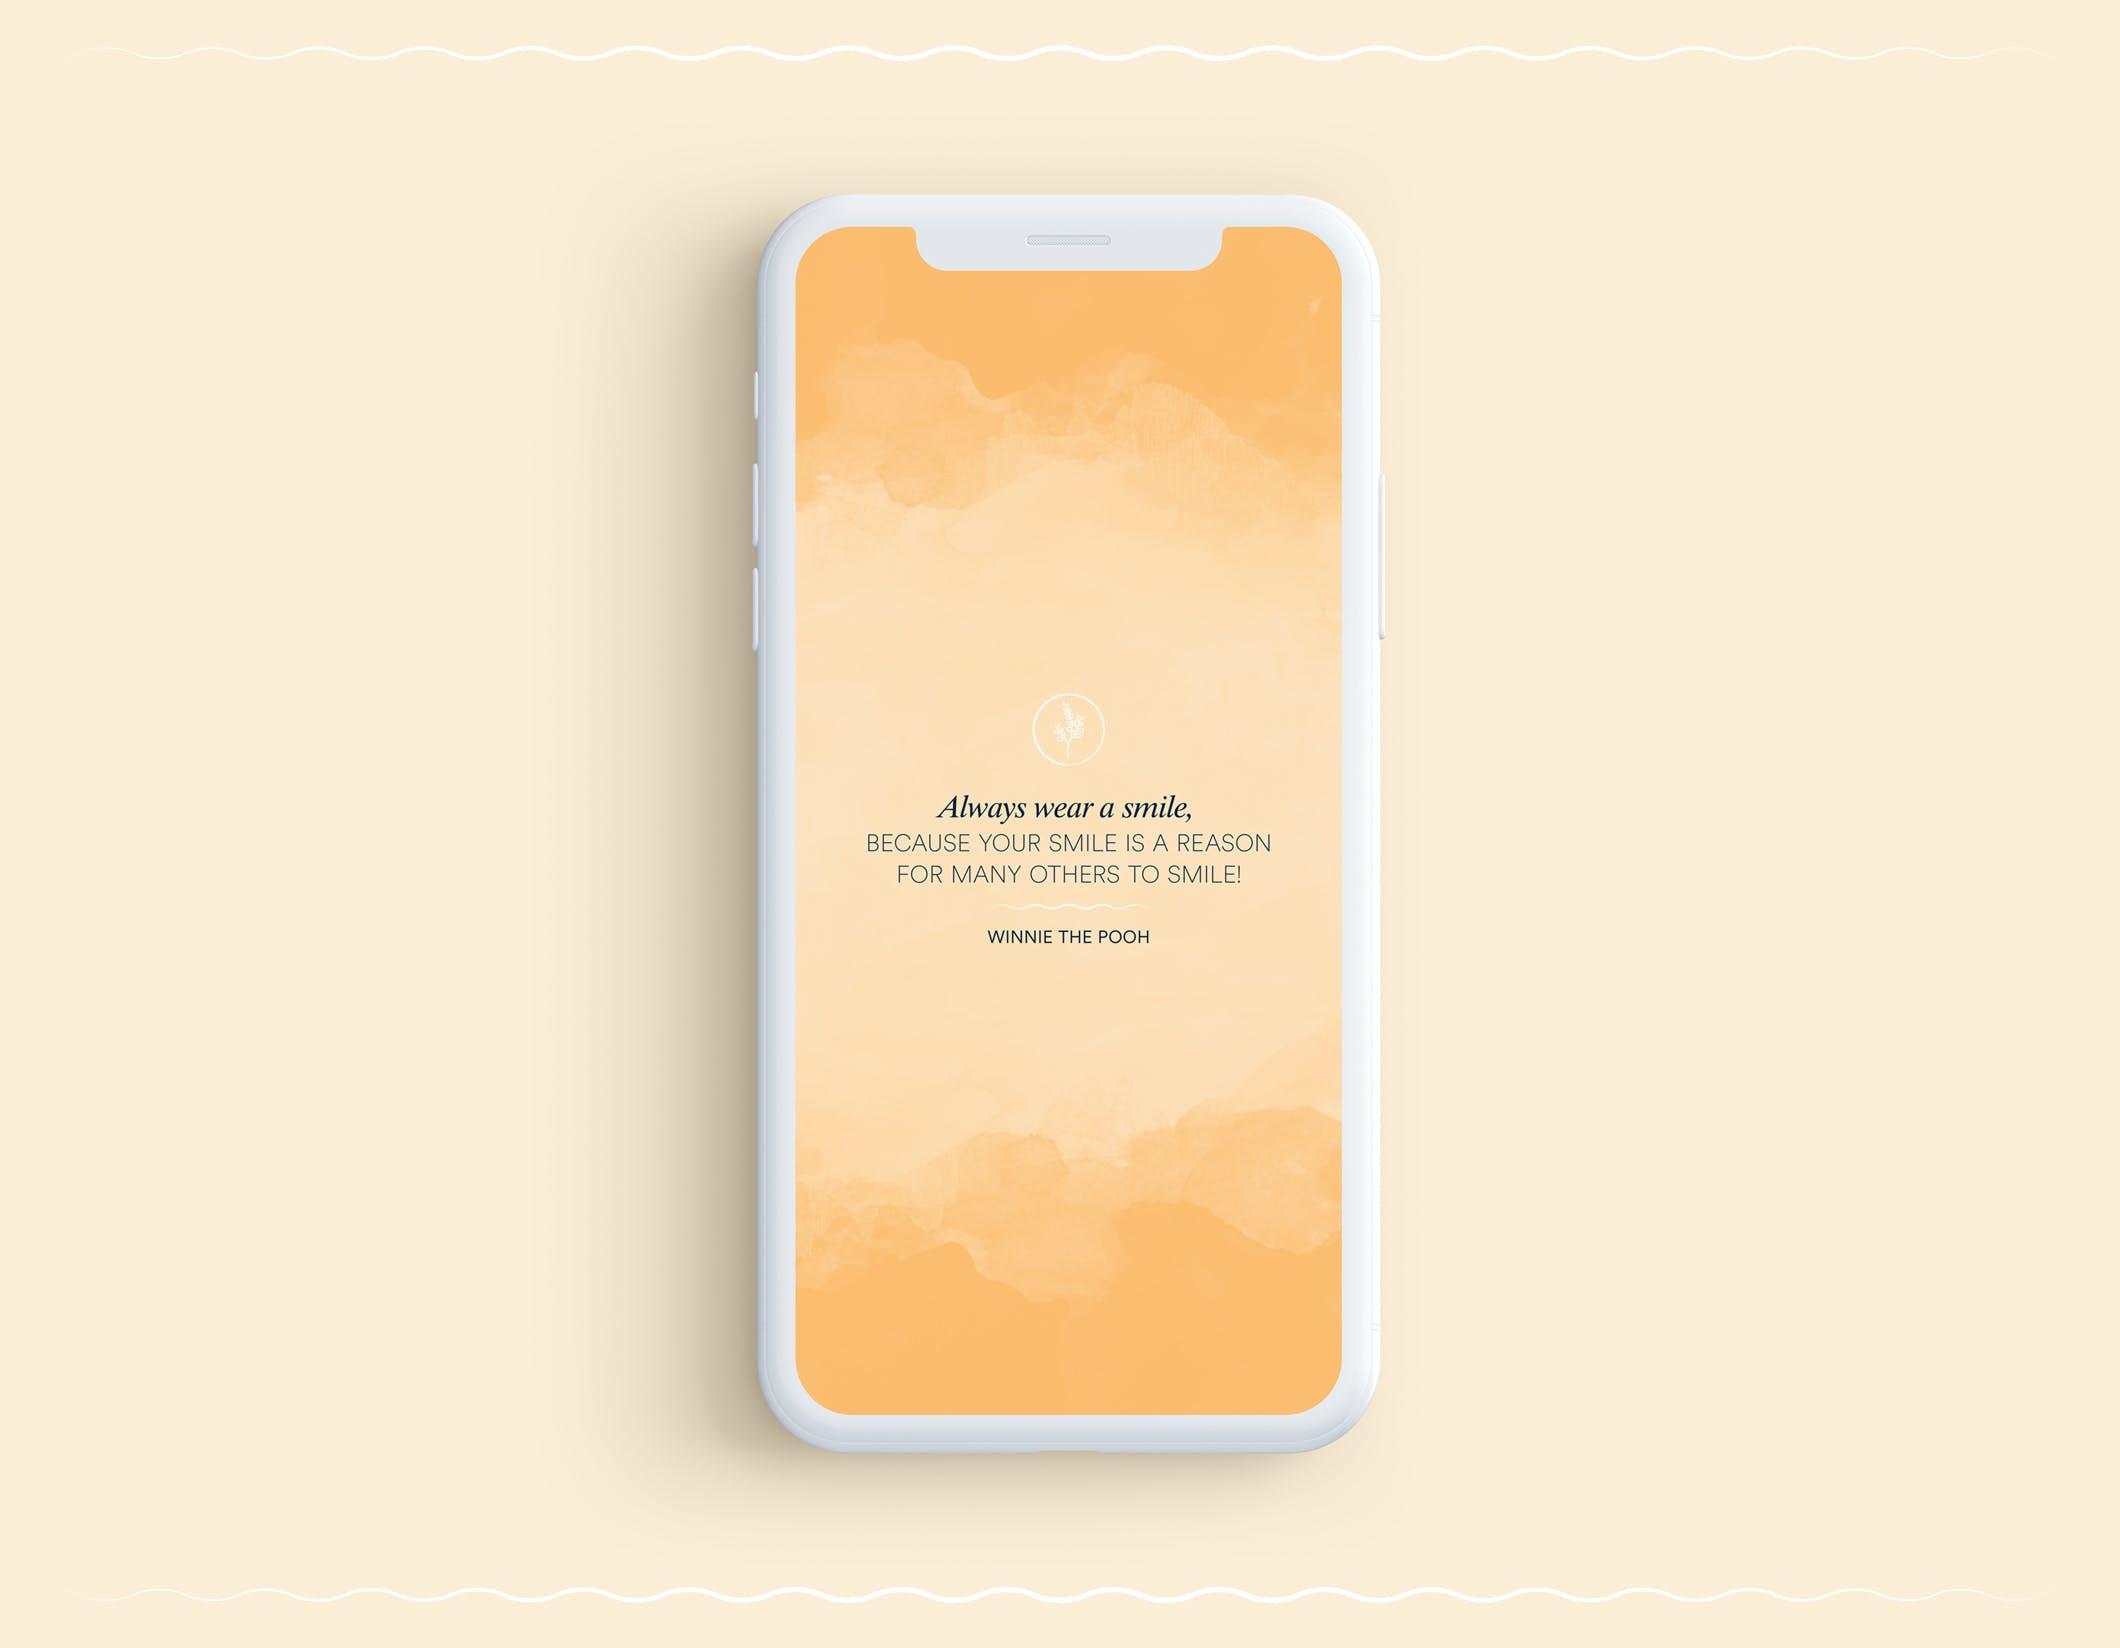 smile iphone wallpaper